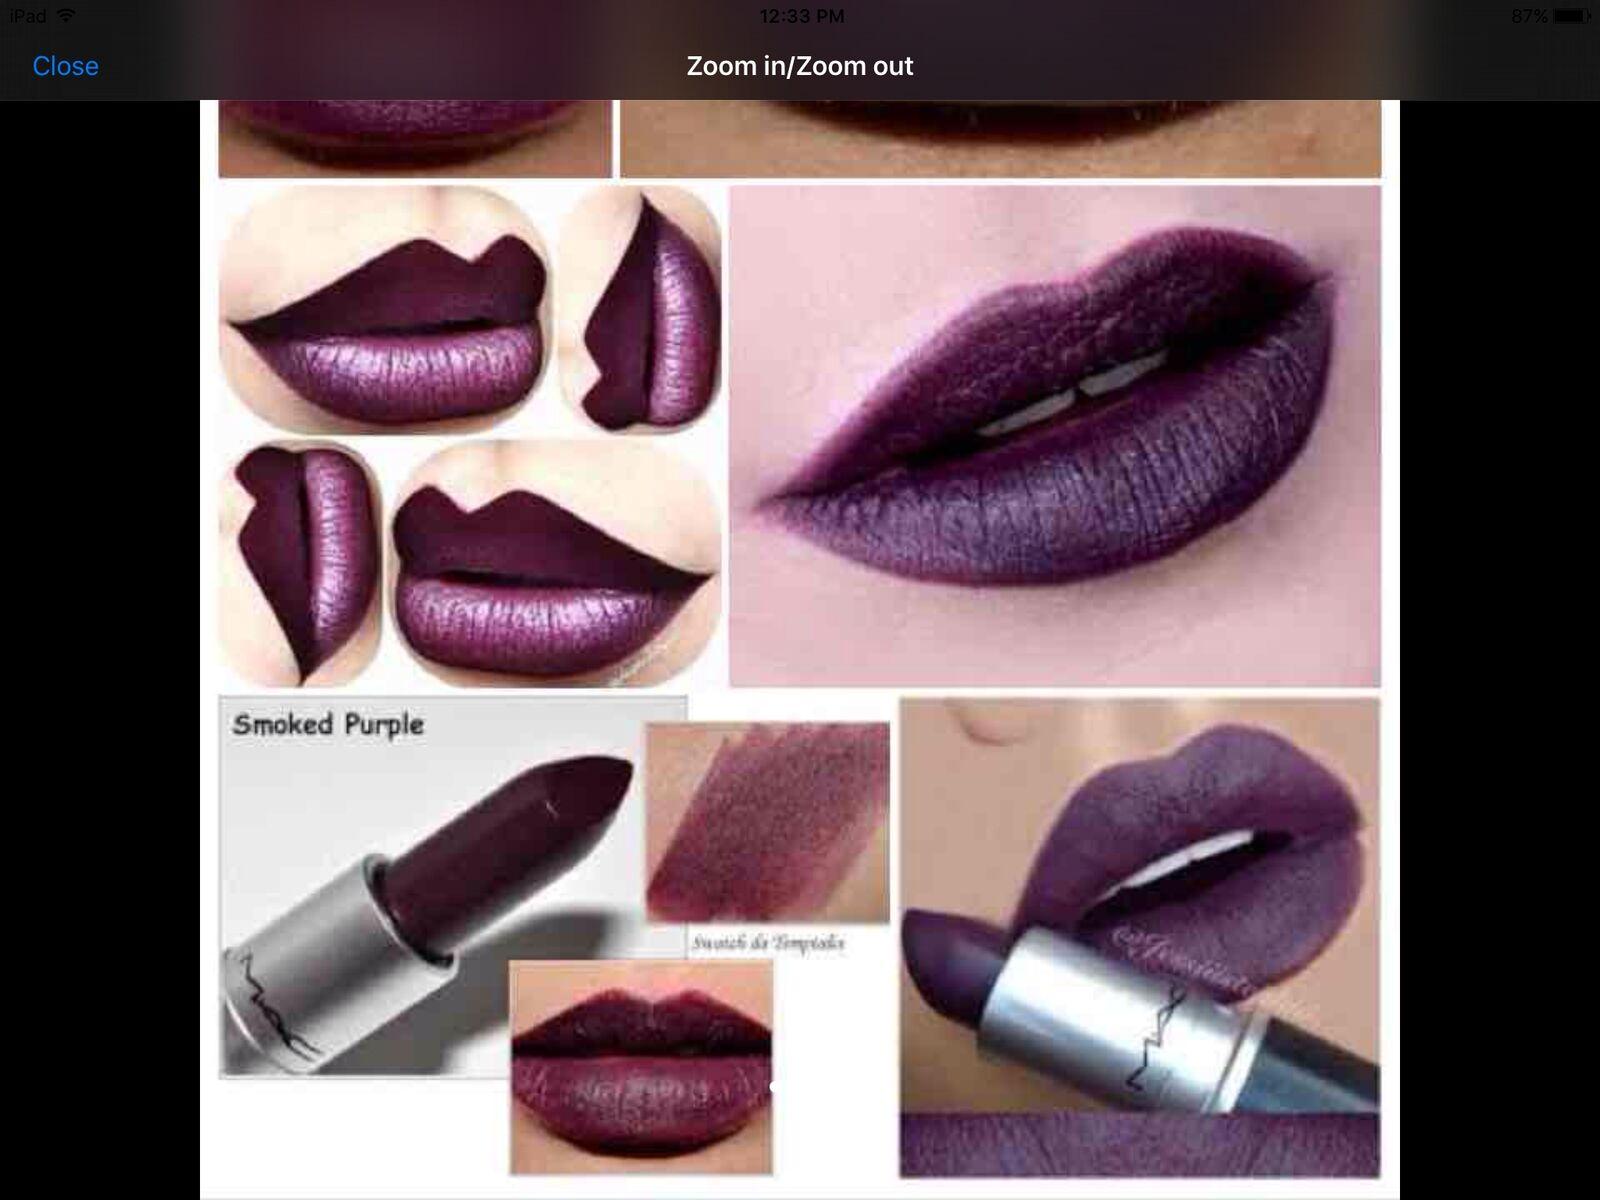 Favori Mac Matte Lipstick Smoked Purple - 100 Authentic | eBay DS95